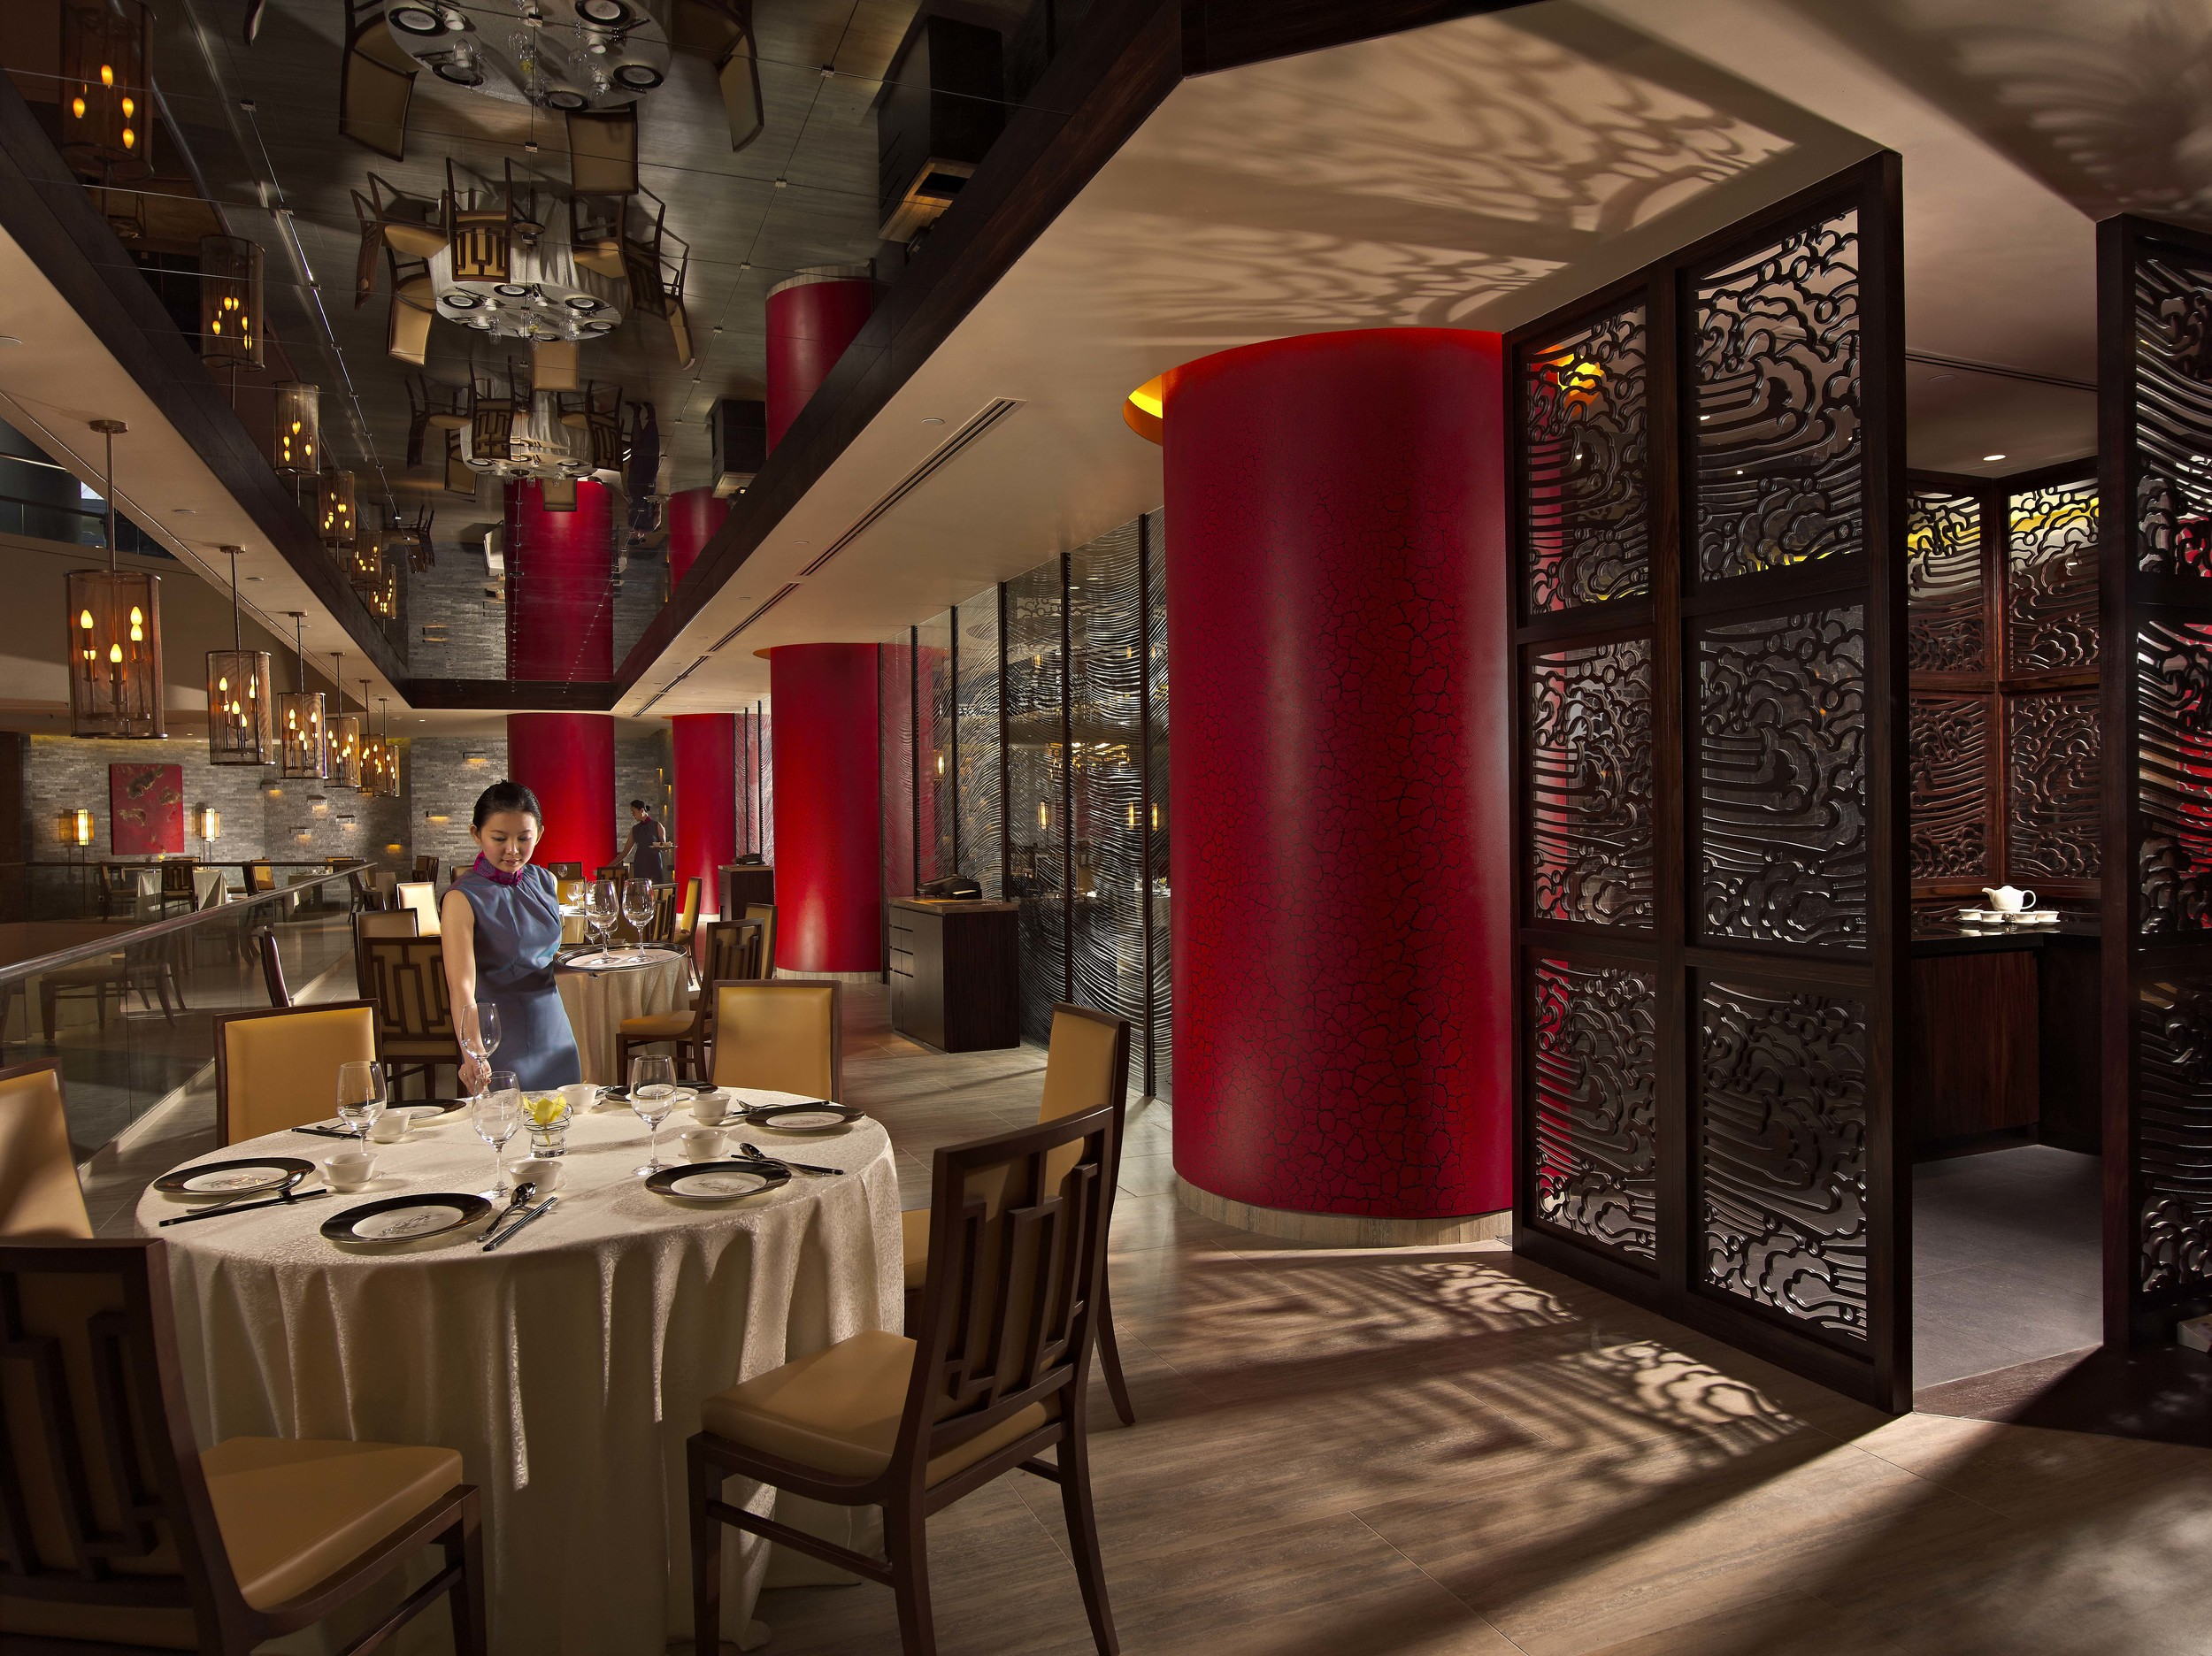 Main Dining Area of Hai Tien Lo | Photo Credit: Pan Pacific Singapore